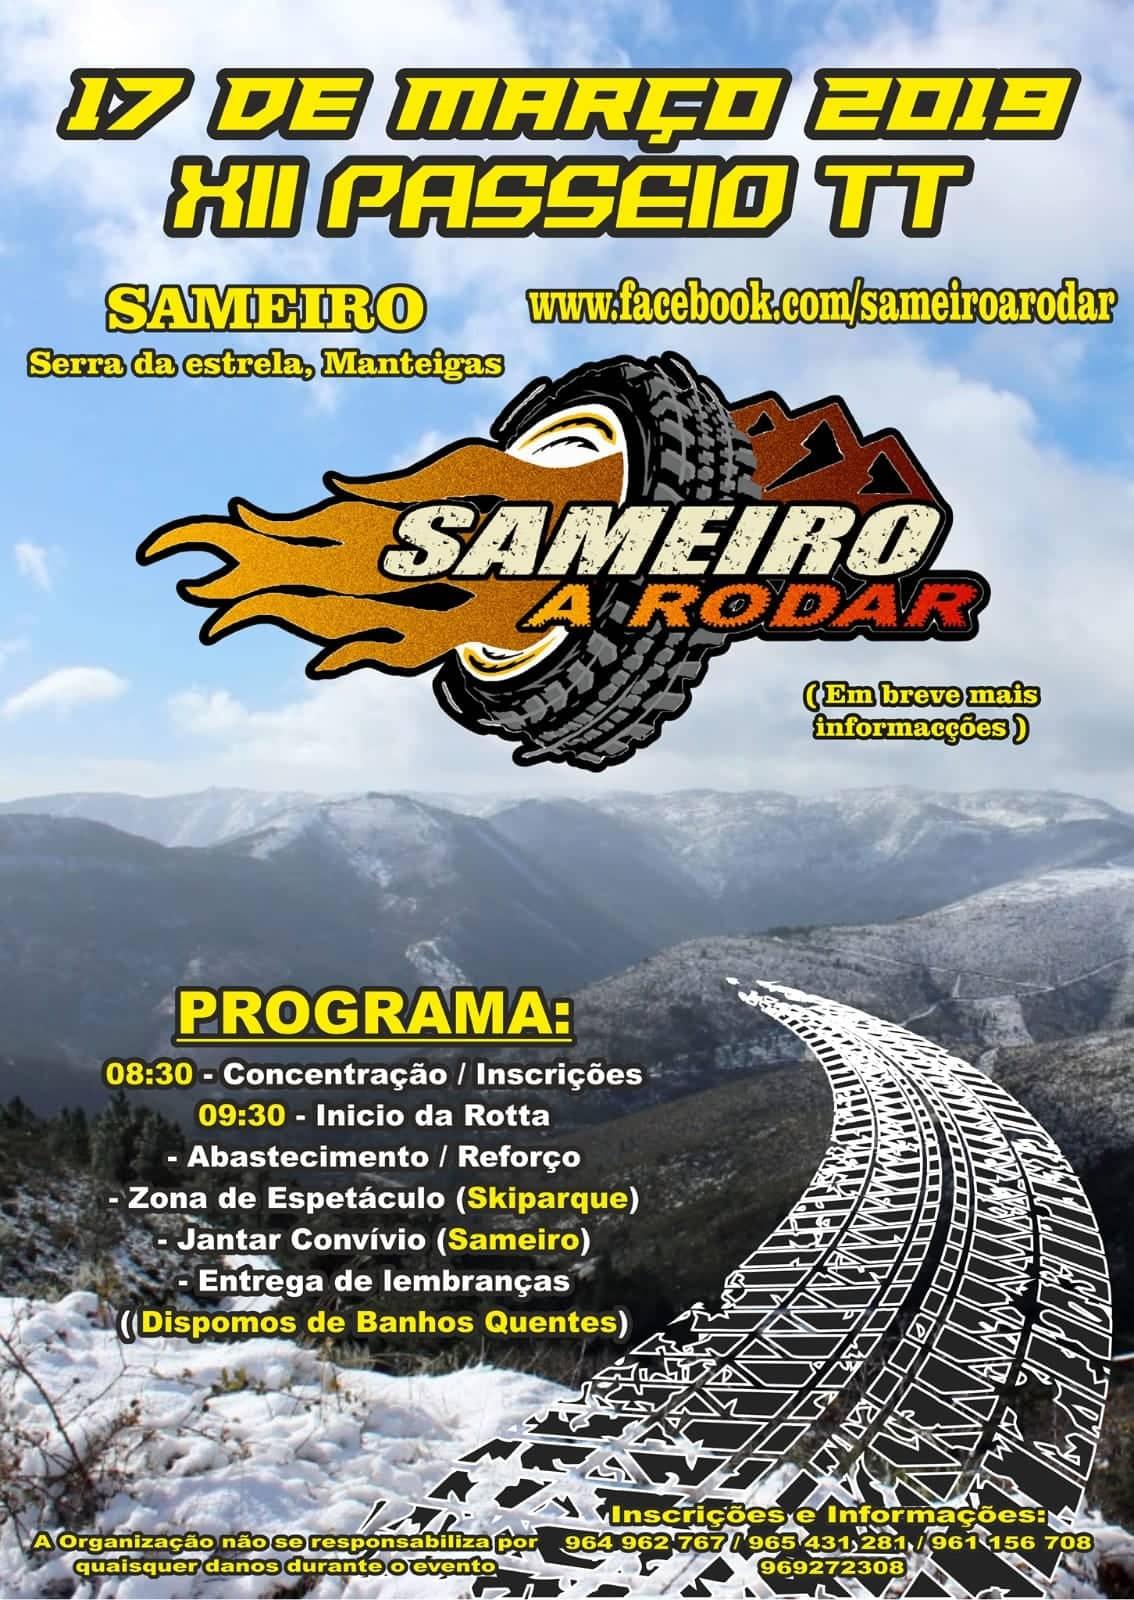 XII Passeio TT - Sameiro a Rodar